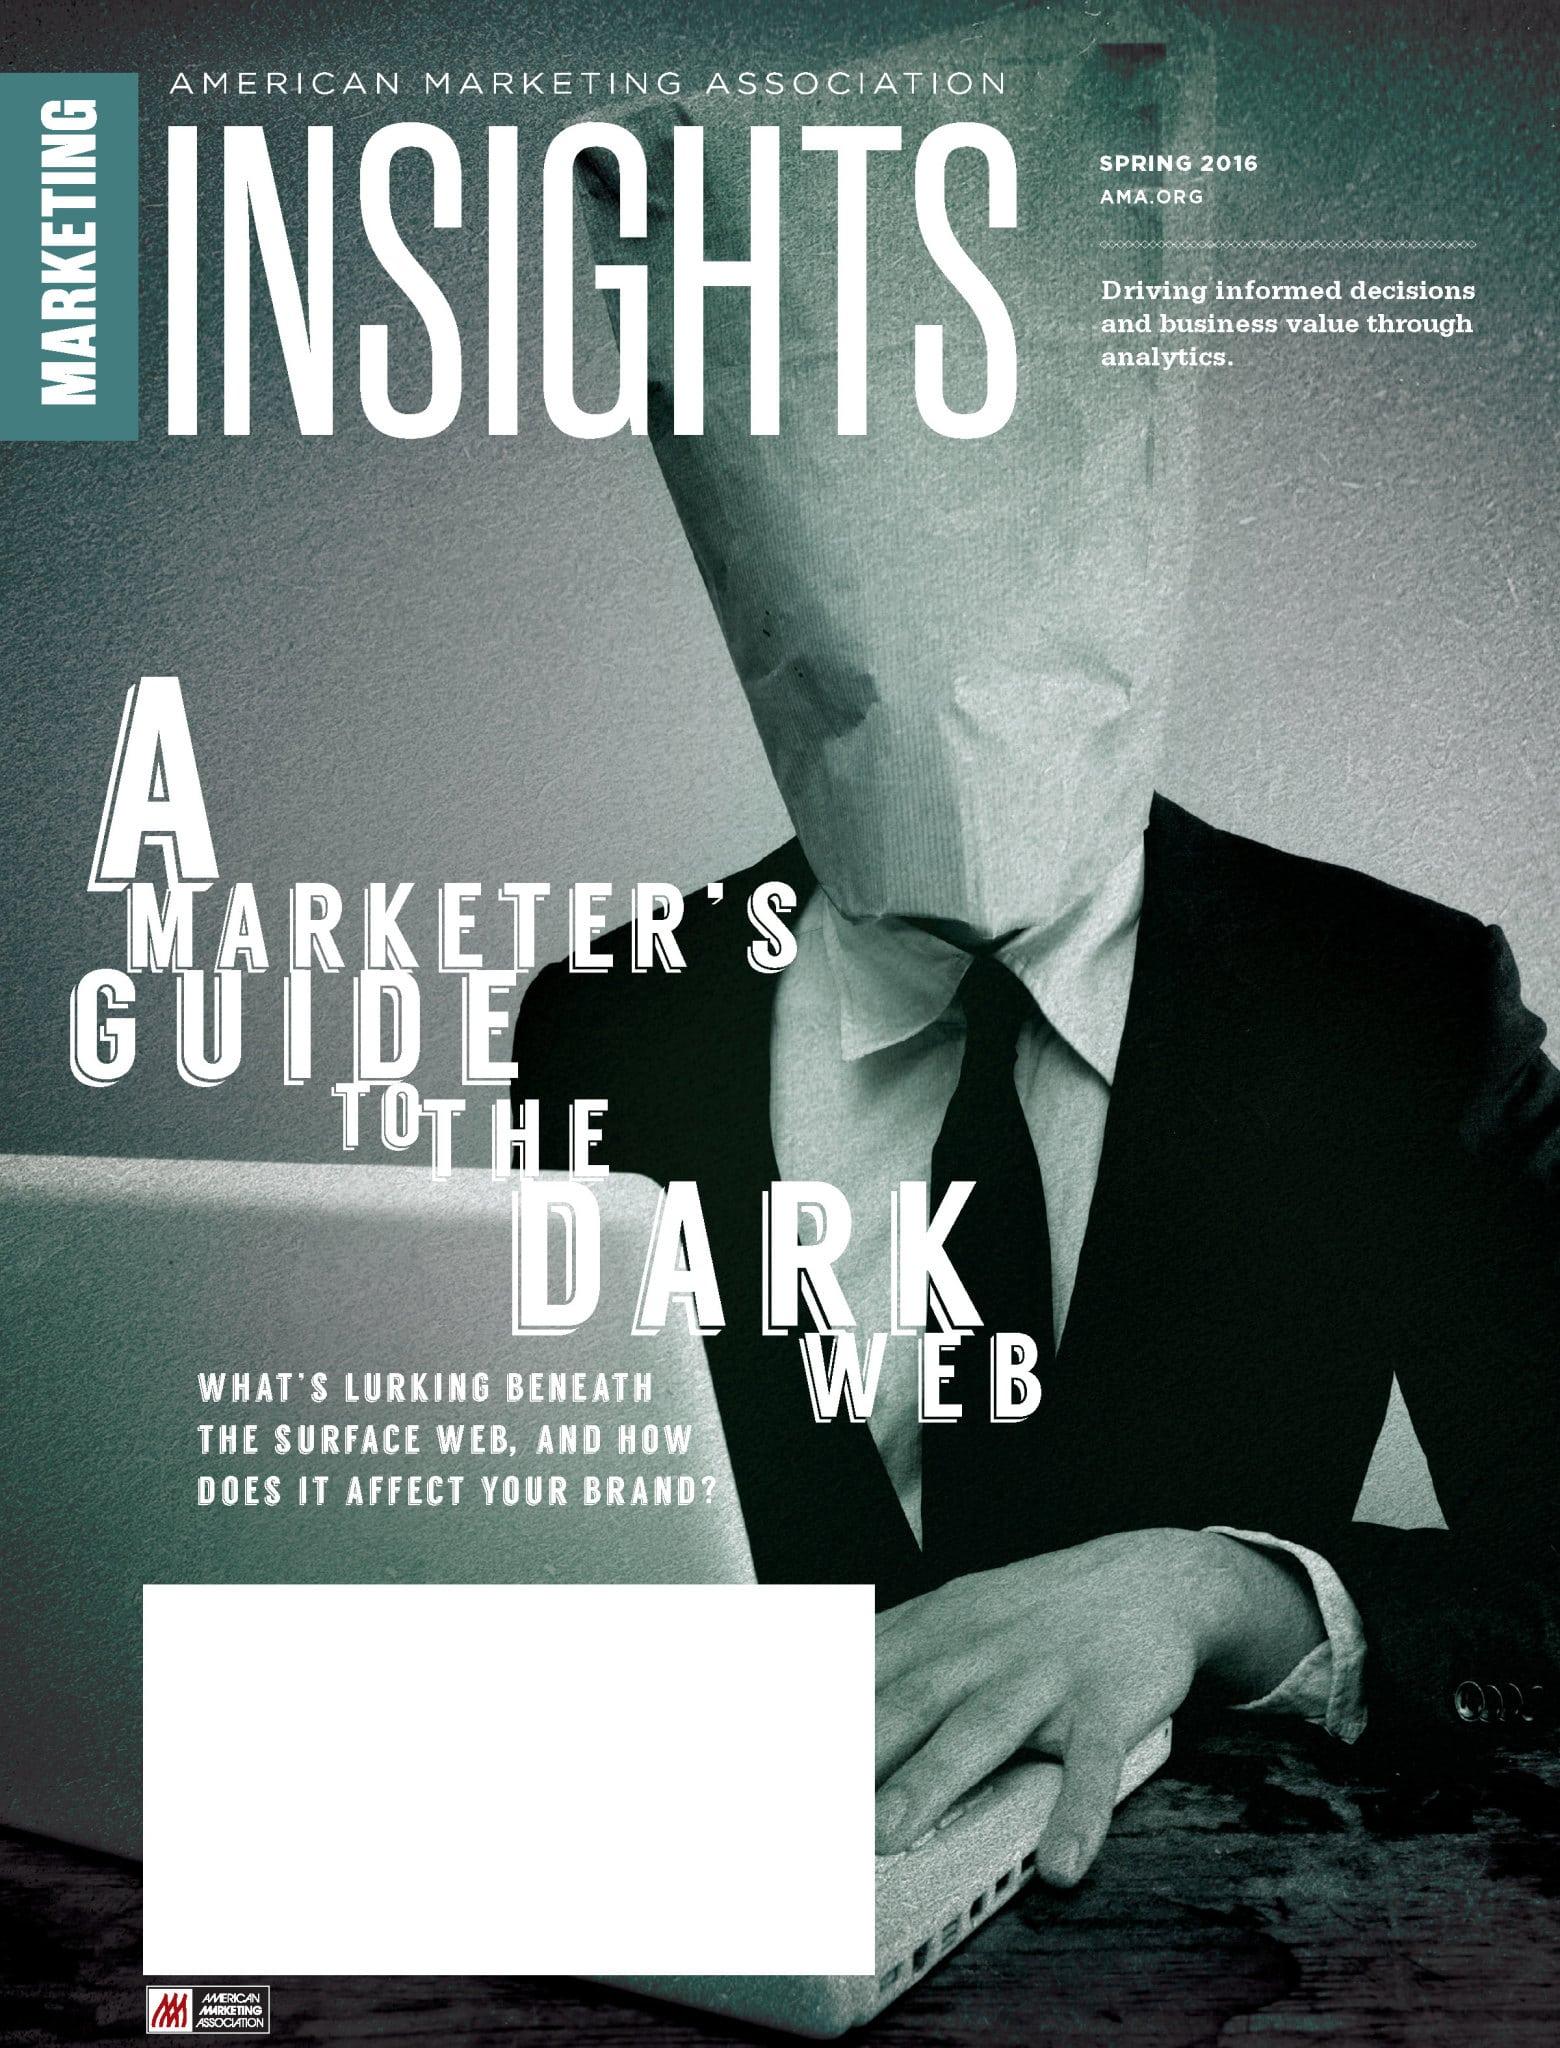 MARKETING_INSIGHTS_ASNP_Single Article